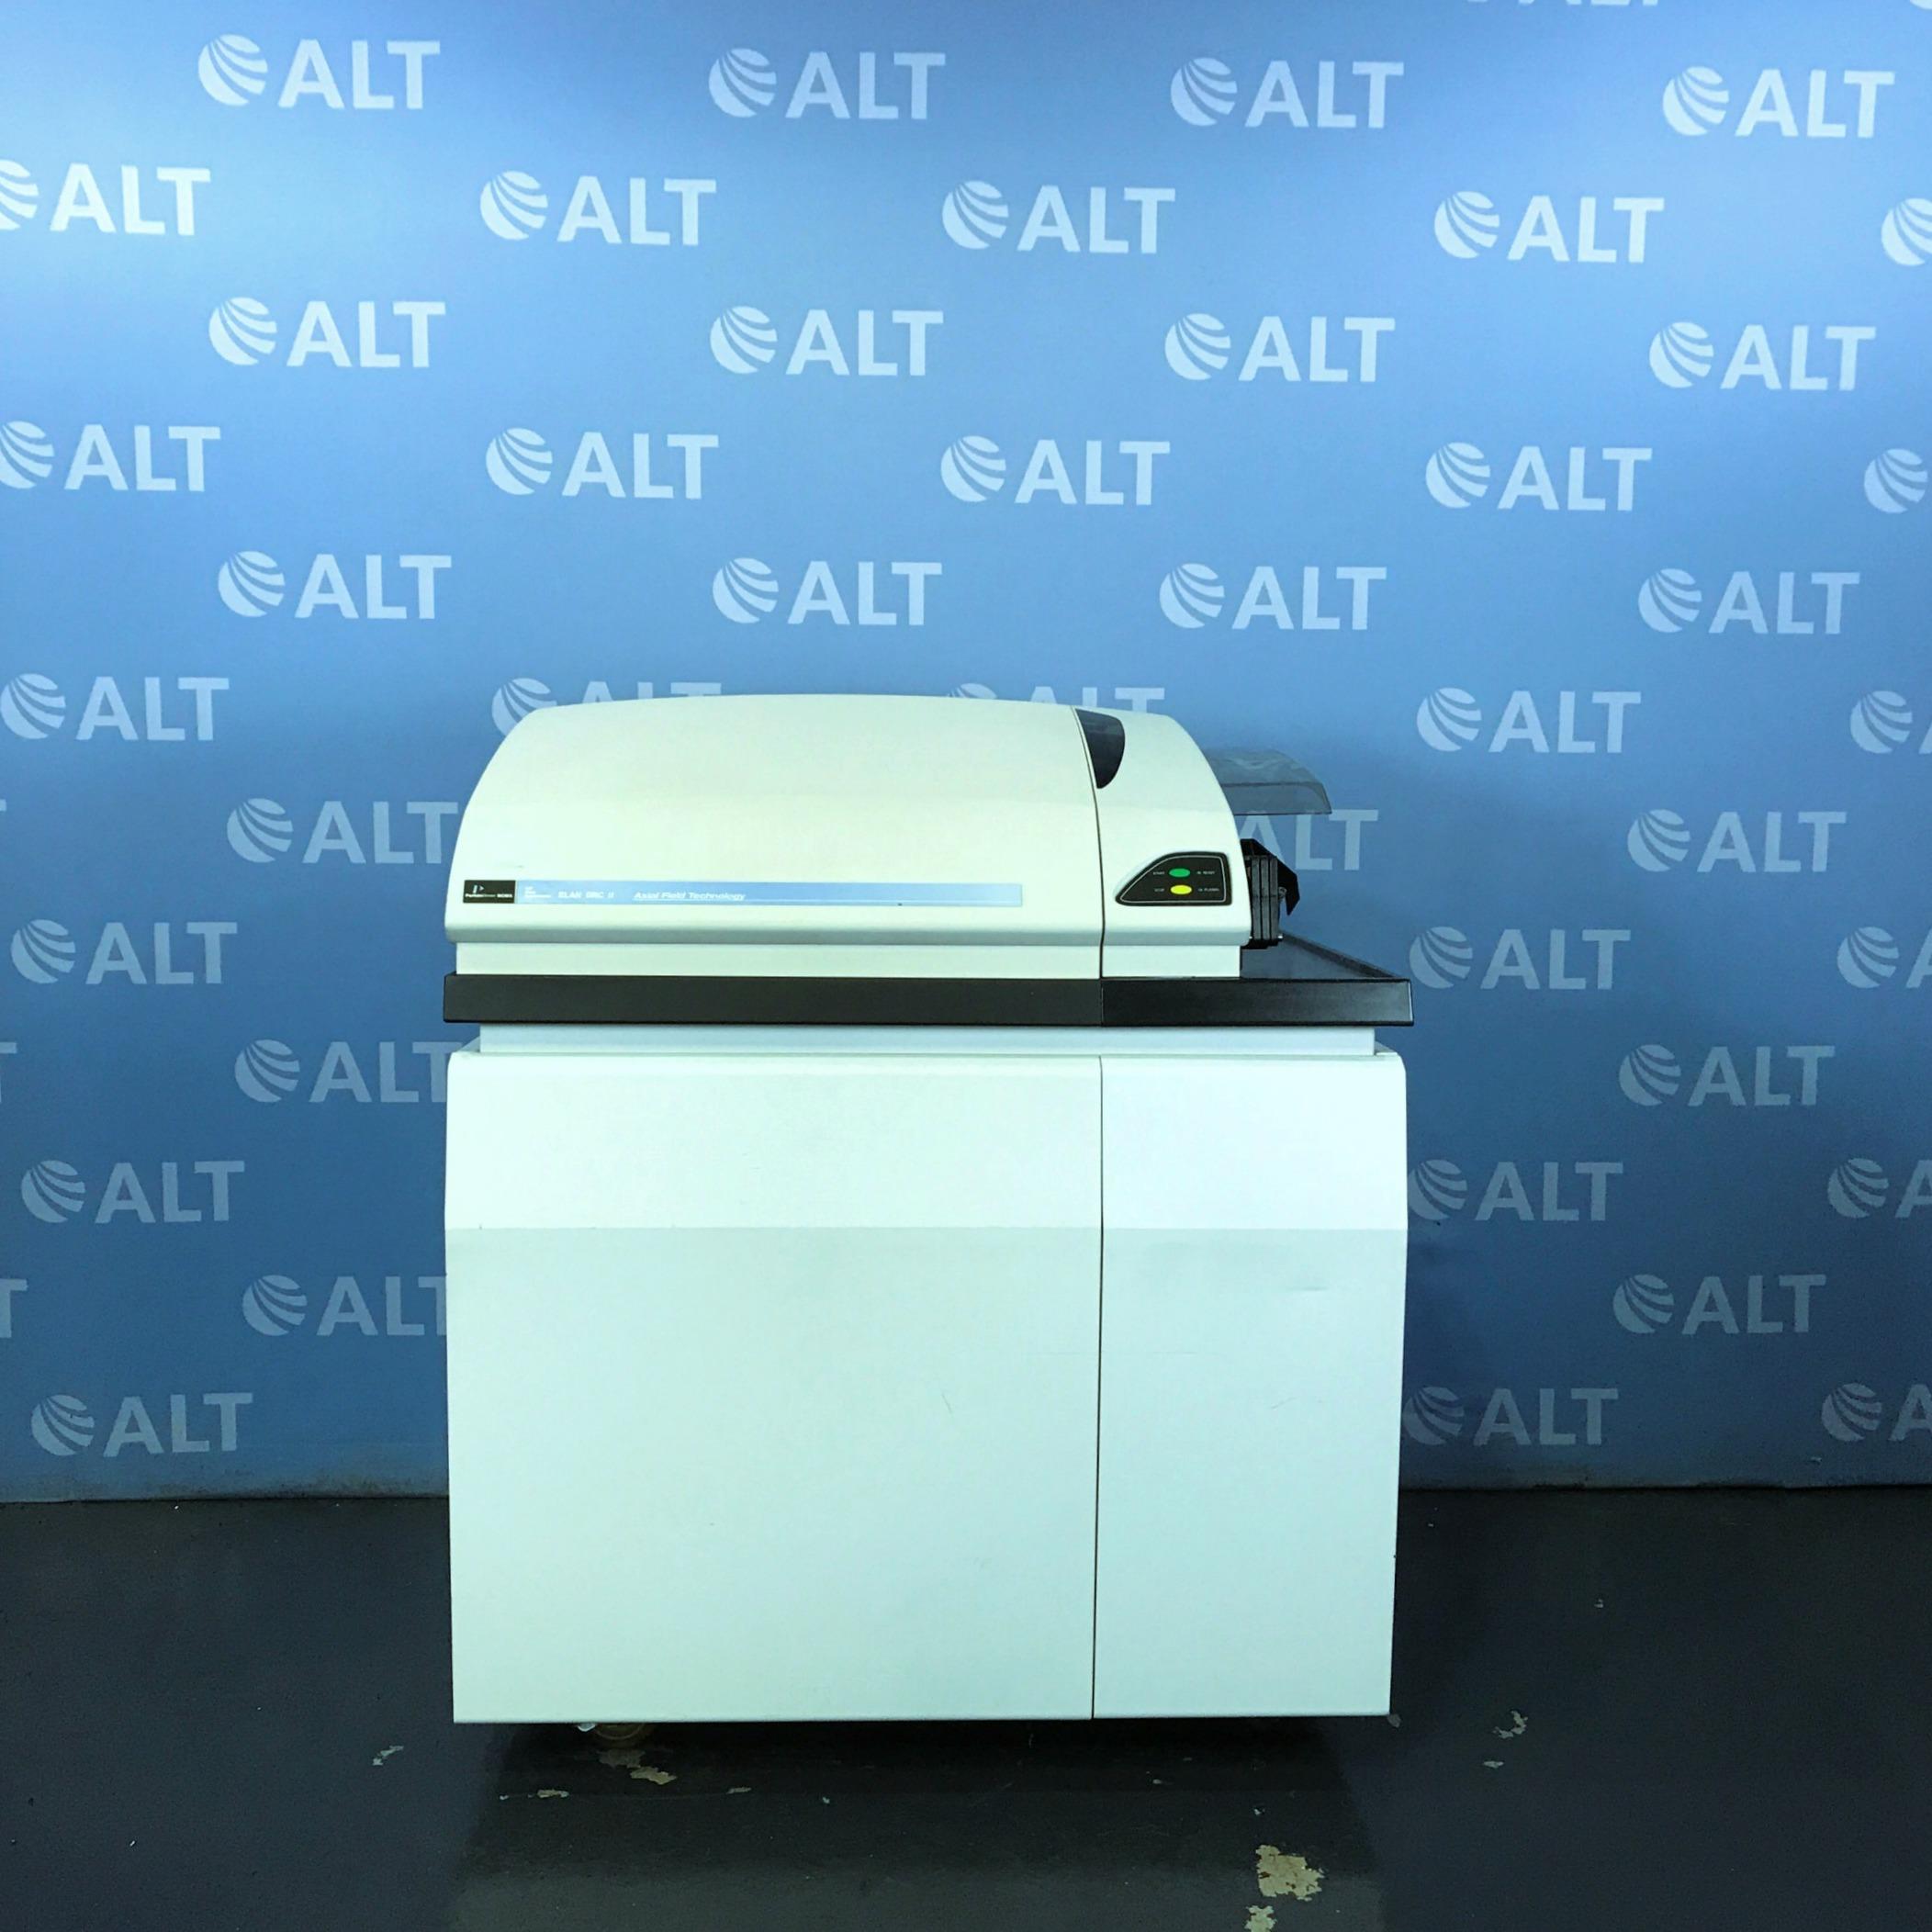 ELAN DRC II ICP Mass Spectrometer With Perkin Elmer AS-93 Plus Autosampler Name